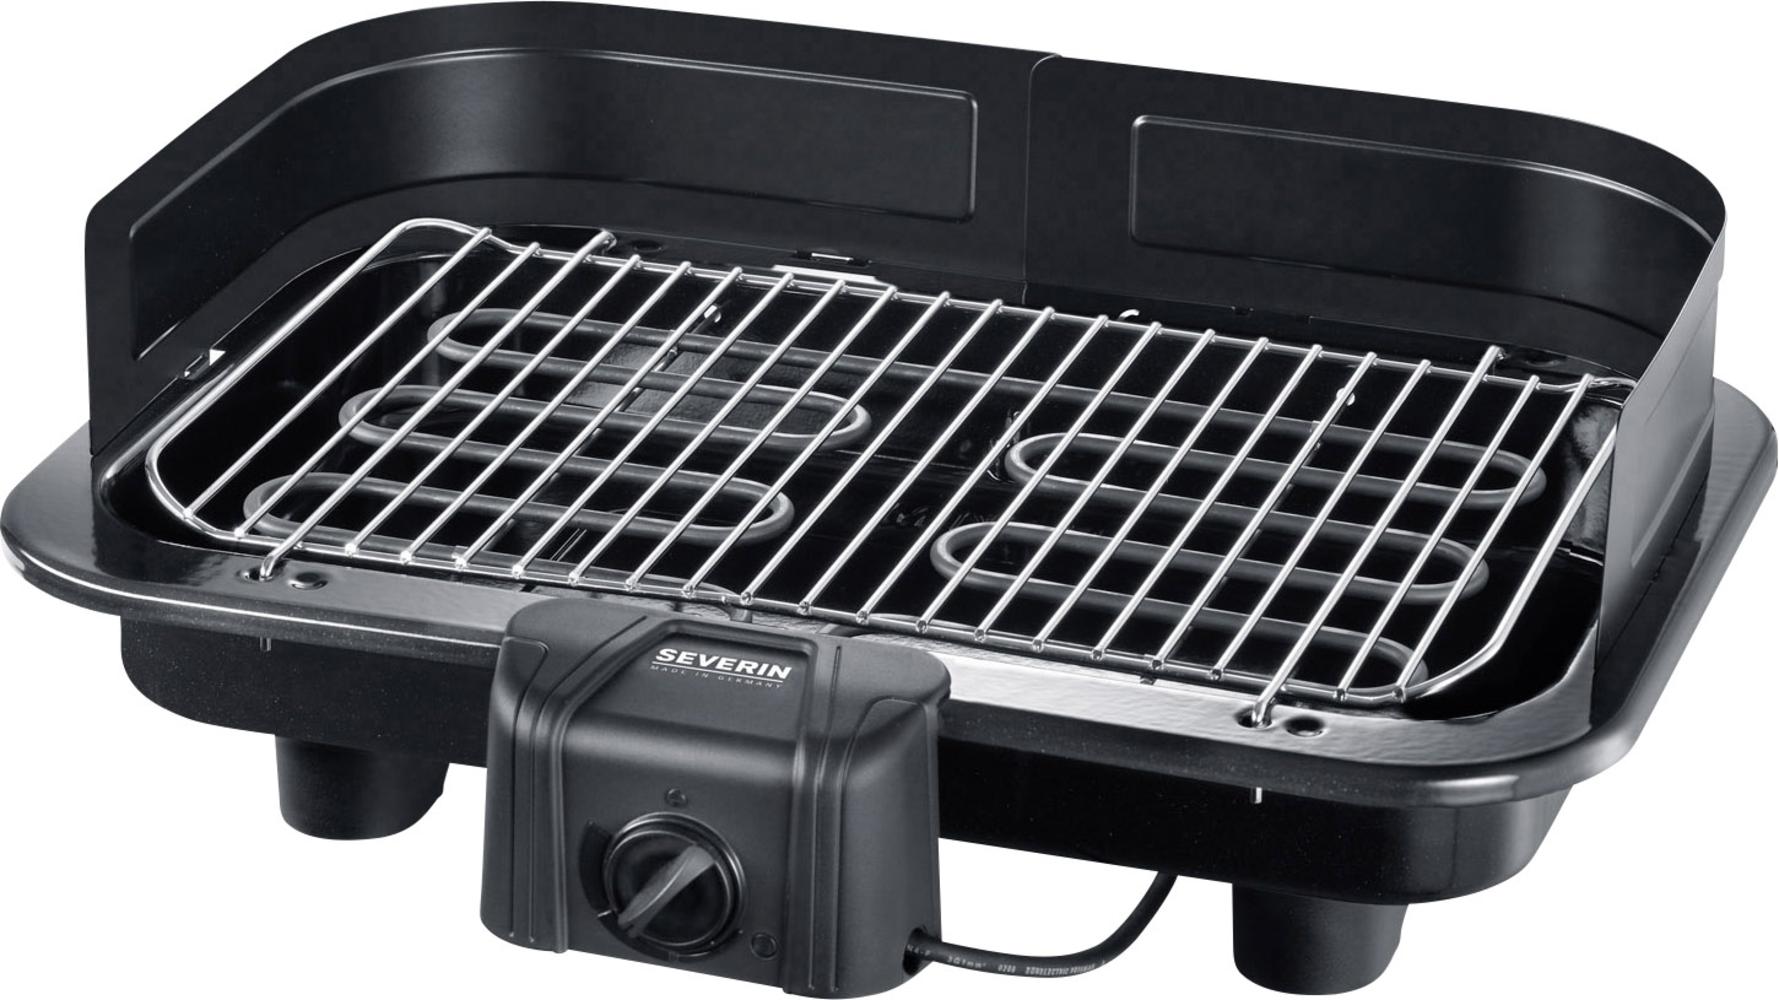 Severin Elektrogrill Pg1511 : Severin pg barbecue grill ab u ac im preisvergleich kaufen